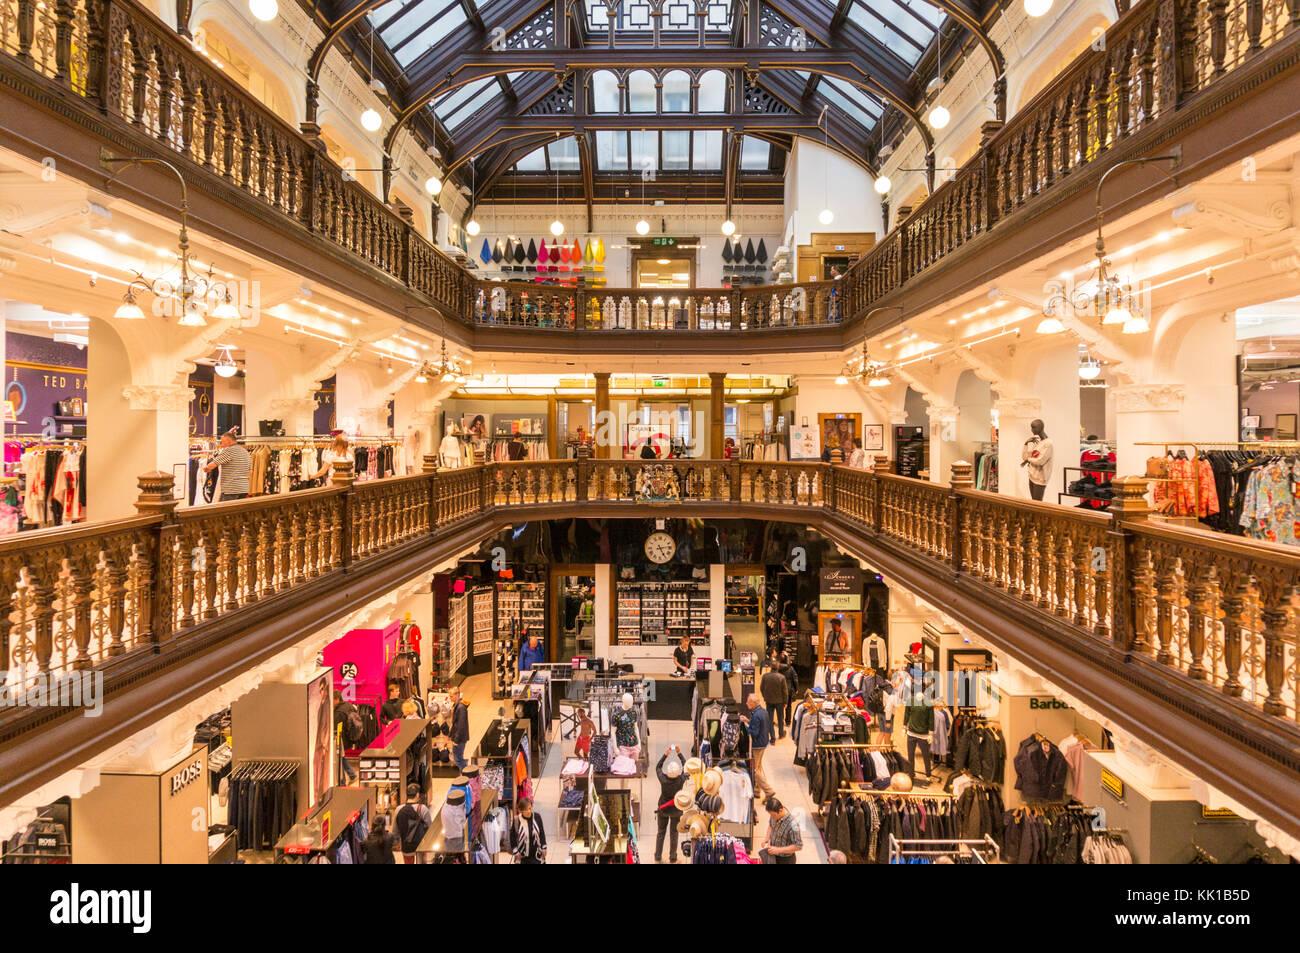 Jenners escocia edimburgo Edimburgo tienda Jenners interior muestra tres diferentes niveles minorista o Pisos Edimburgo Imagen De Stock